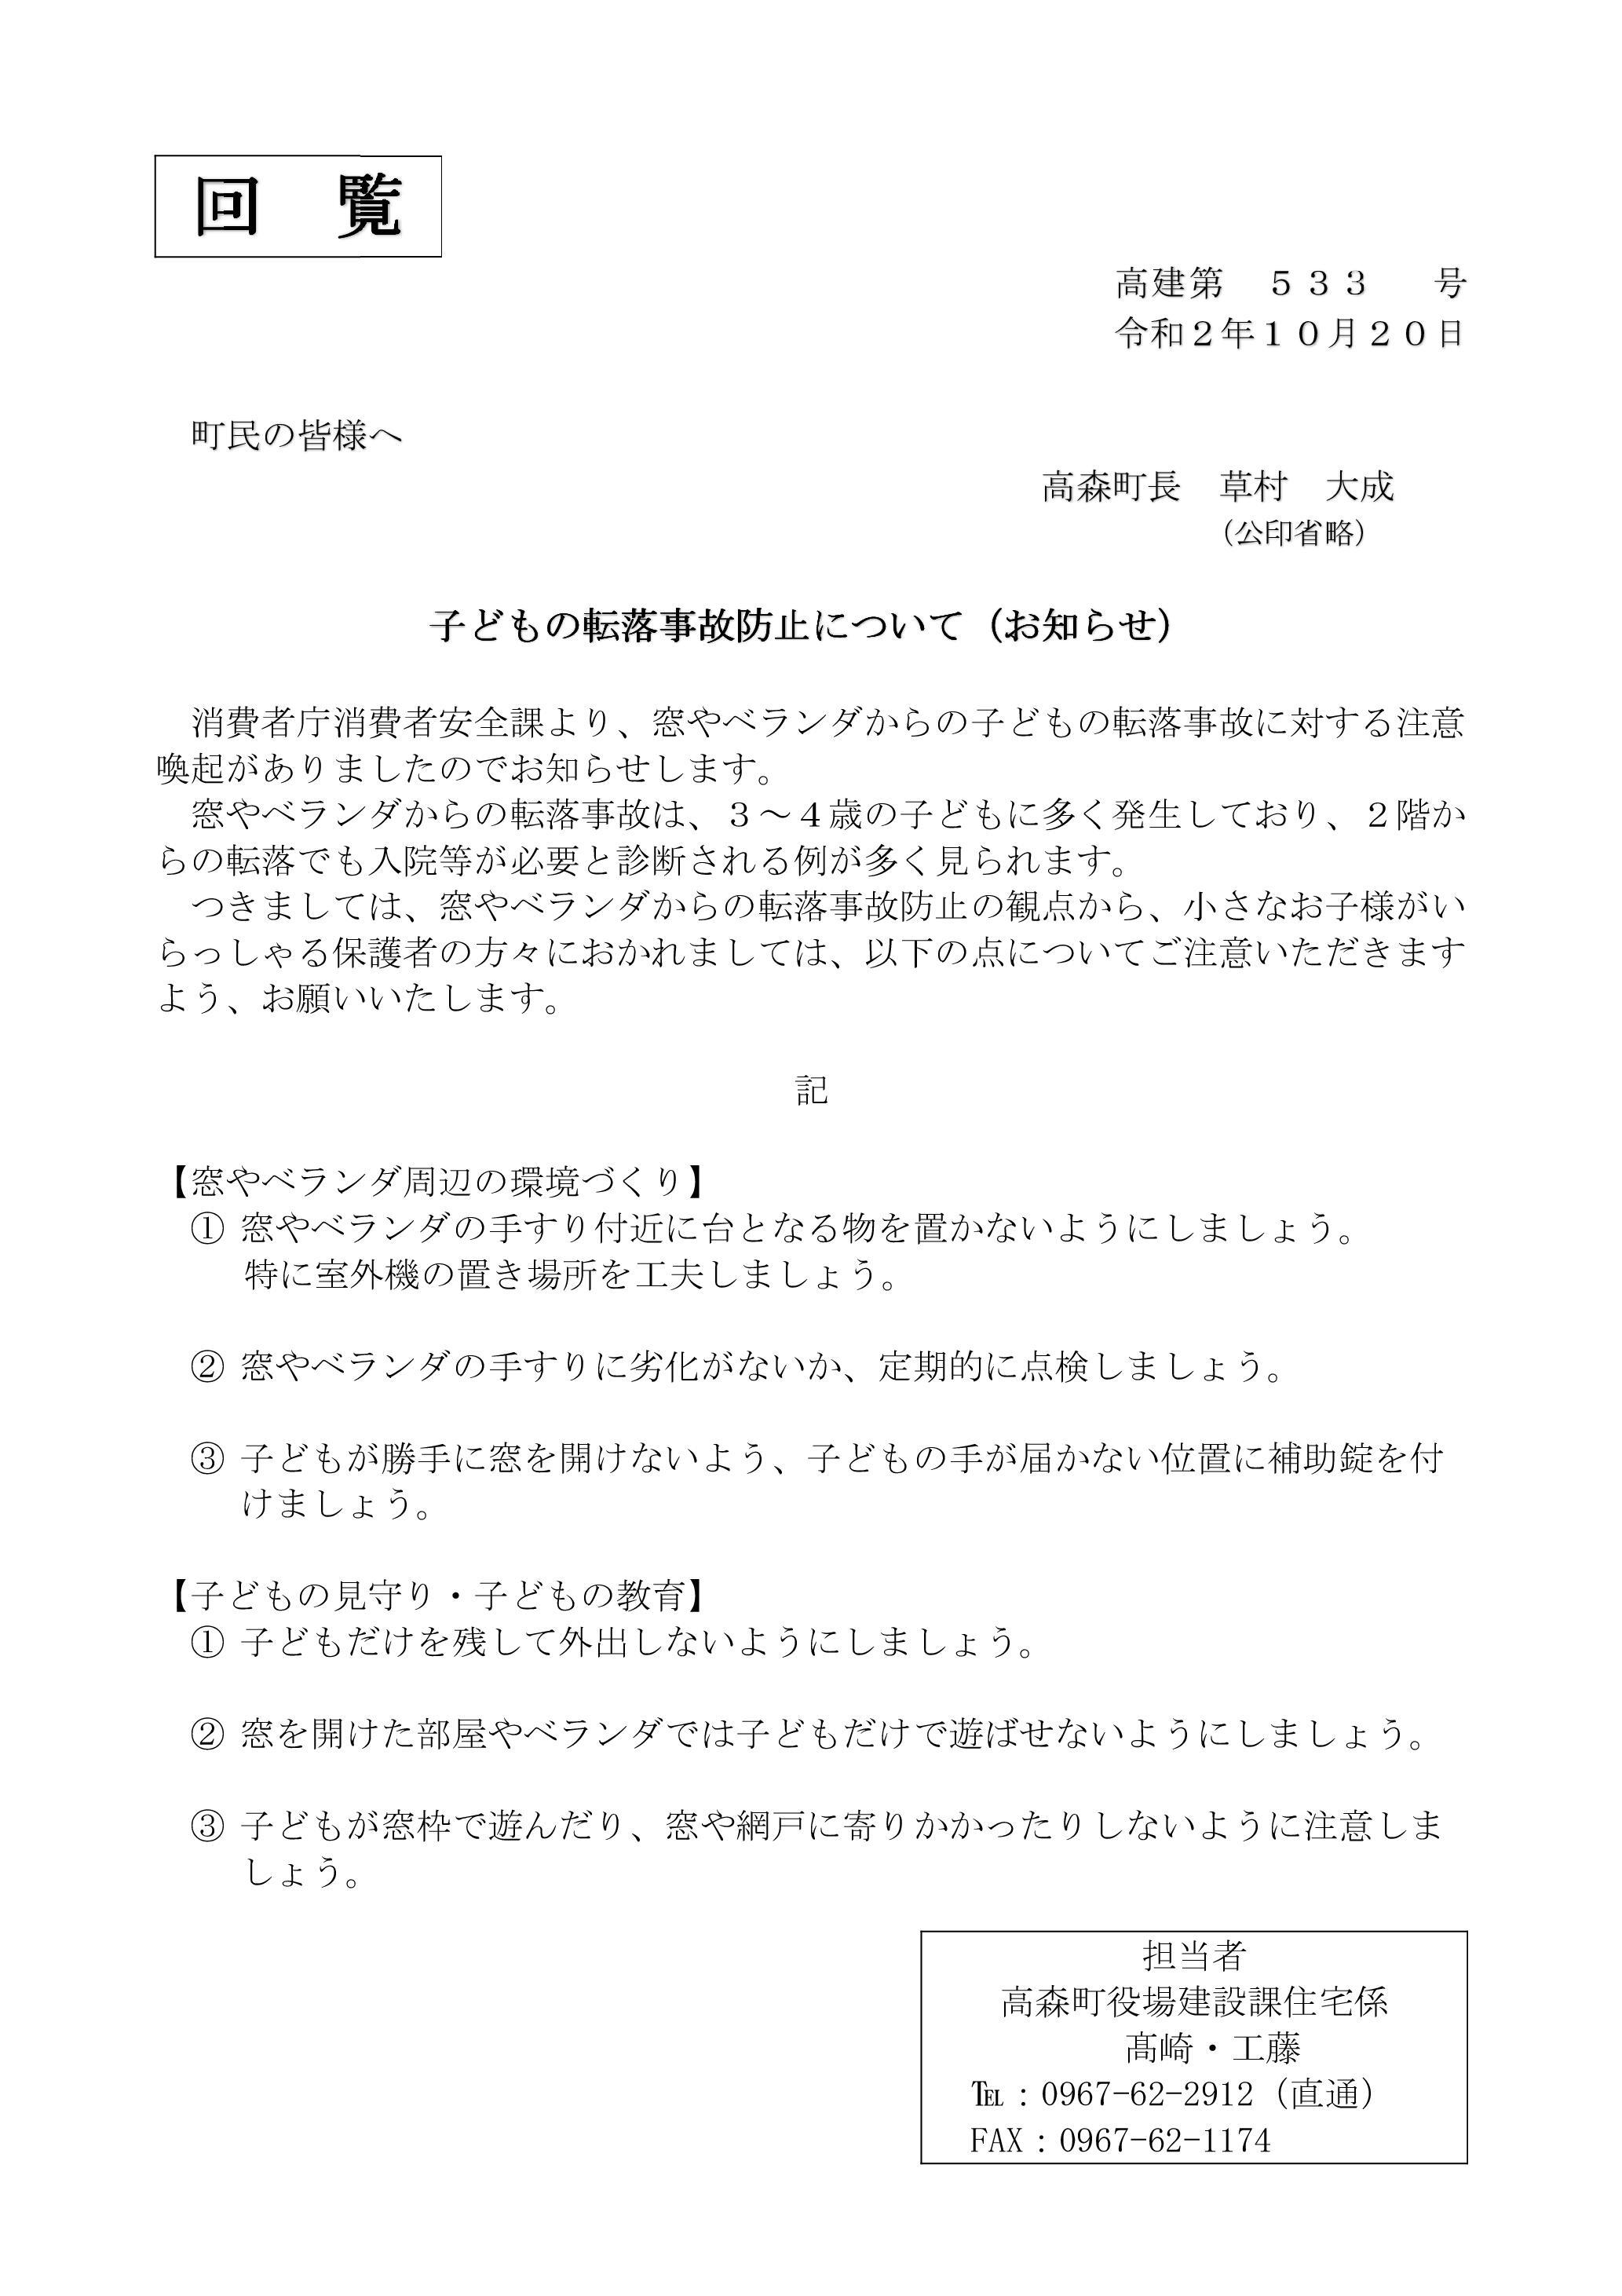 http://www.town.takamori.kumamoto.jp/chosha/somu/upload/ebb85911bdf1287f37f93f666342ba4ea4f420df.jpg